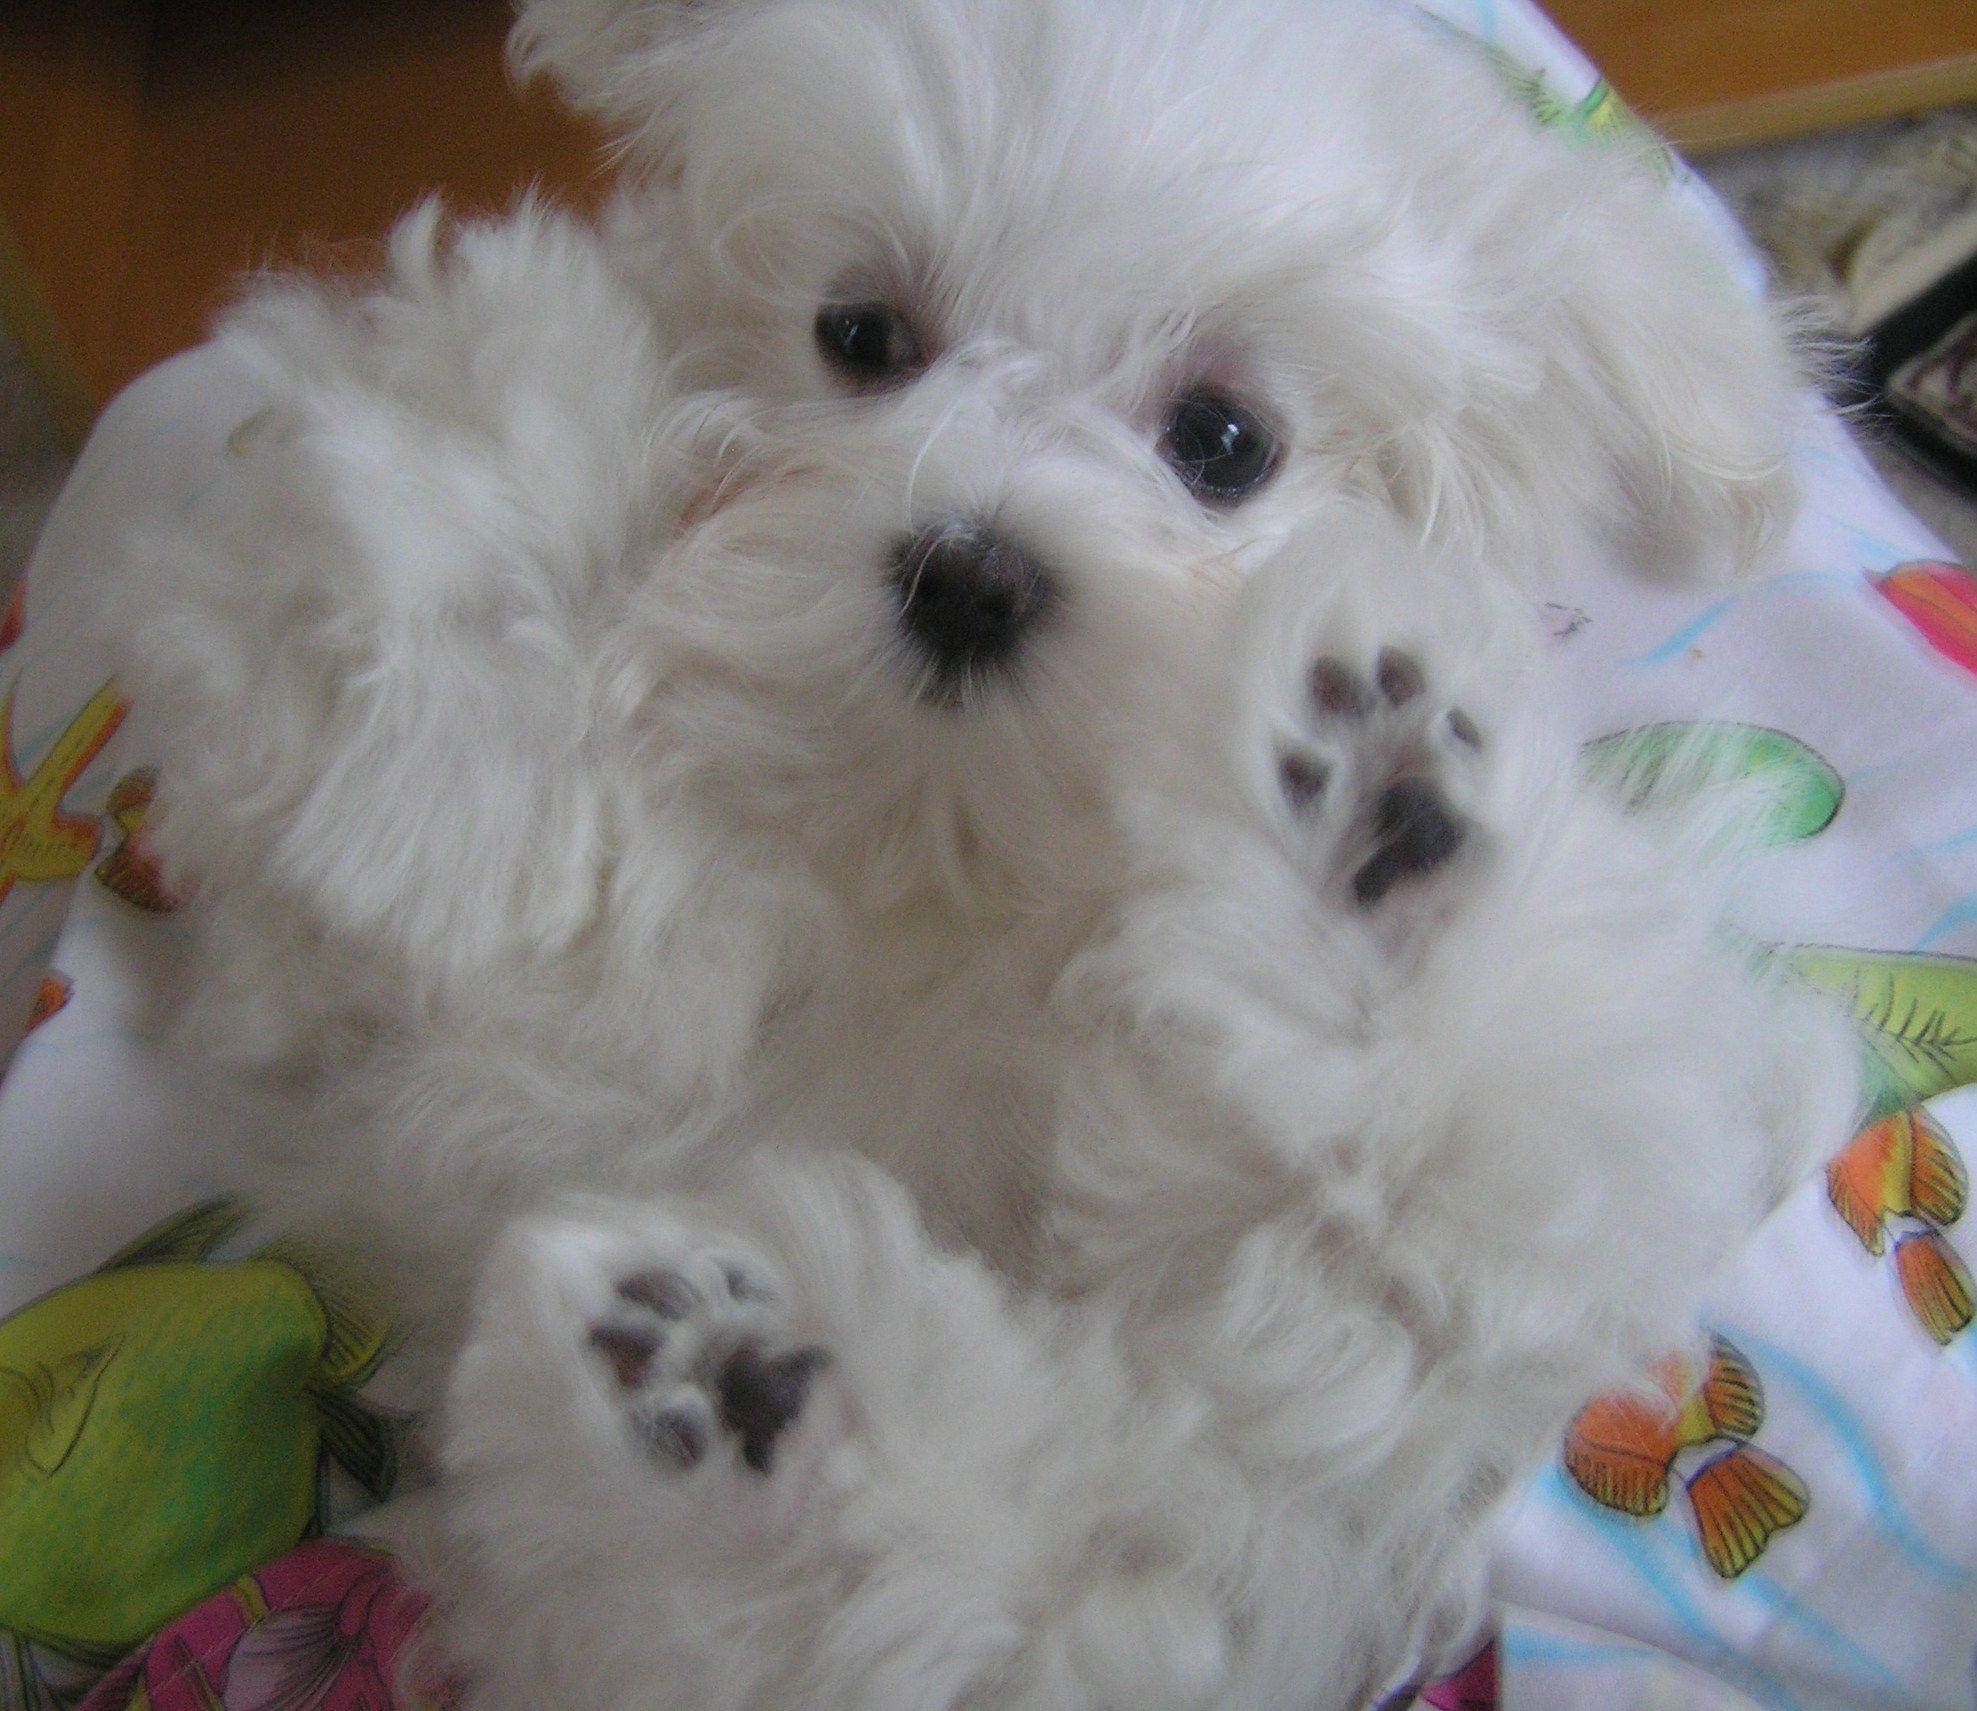 Maltese Pups Maltese Puppy Maltese Dogs Teacup Puppies Maltese